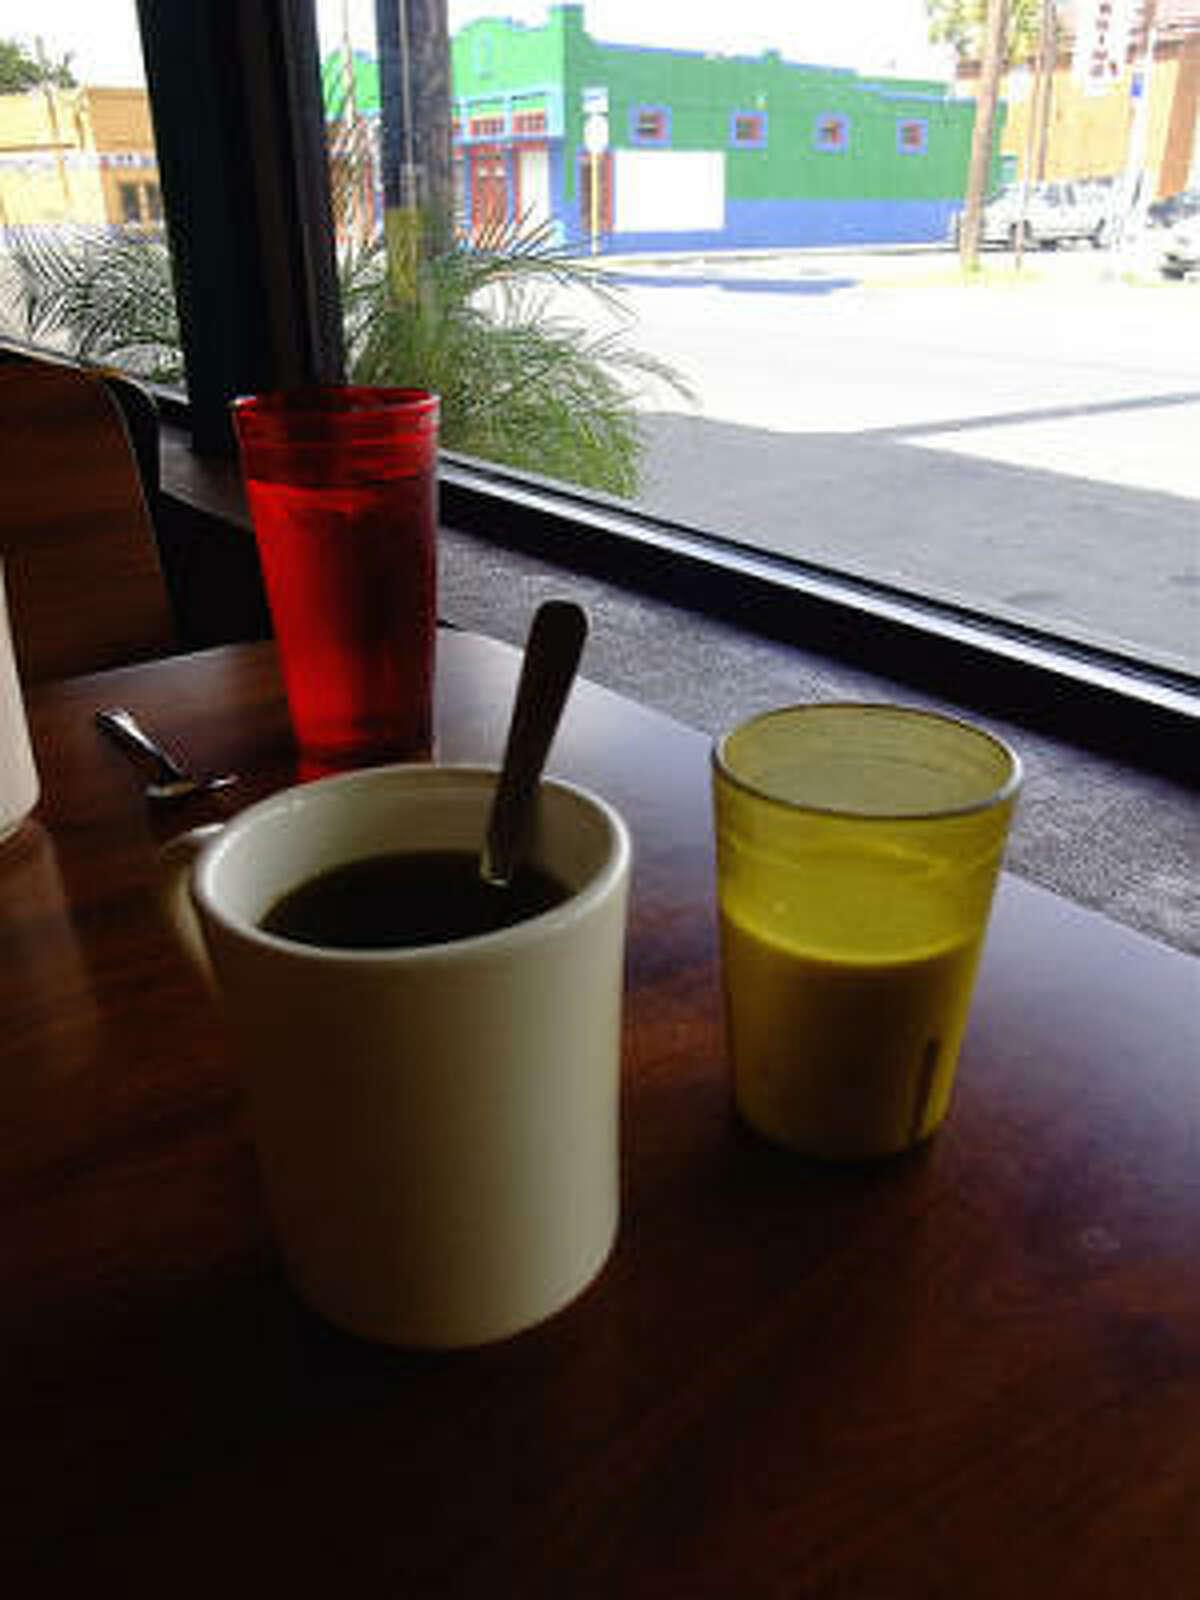 Coffee service at Taco Haven in San Antonio. Note milk delivery in